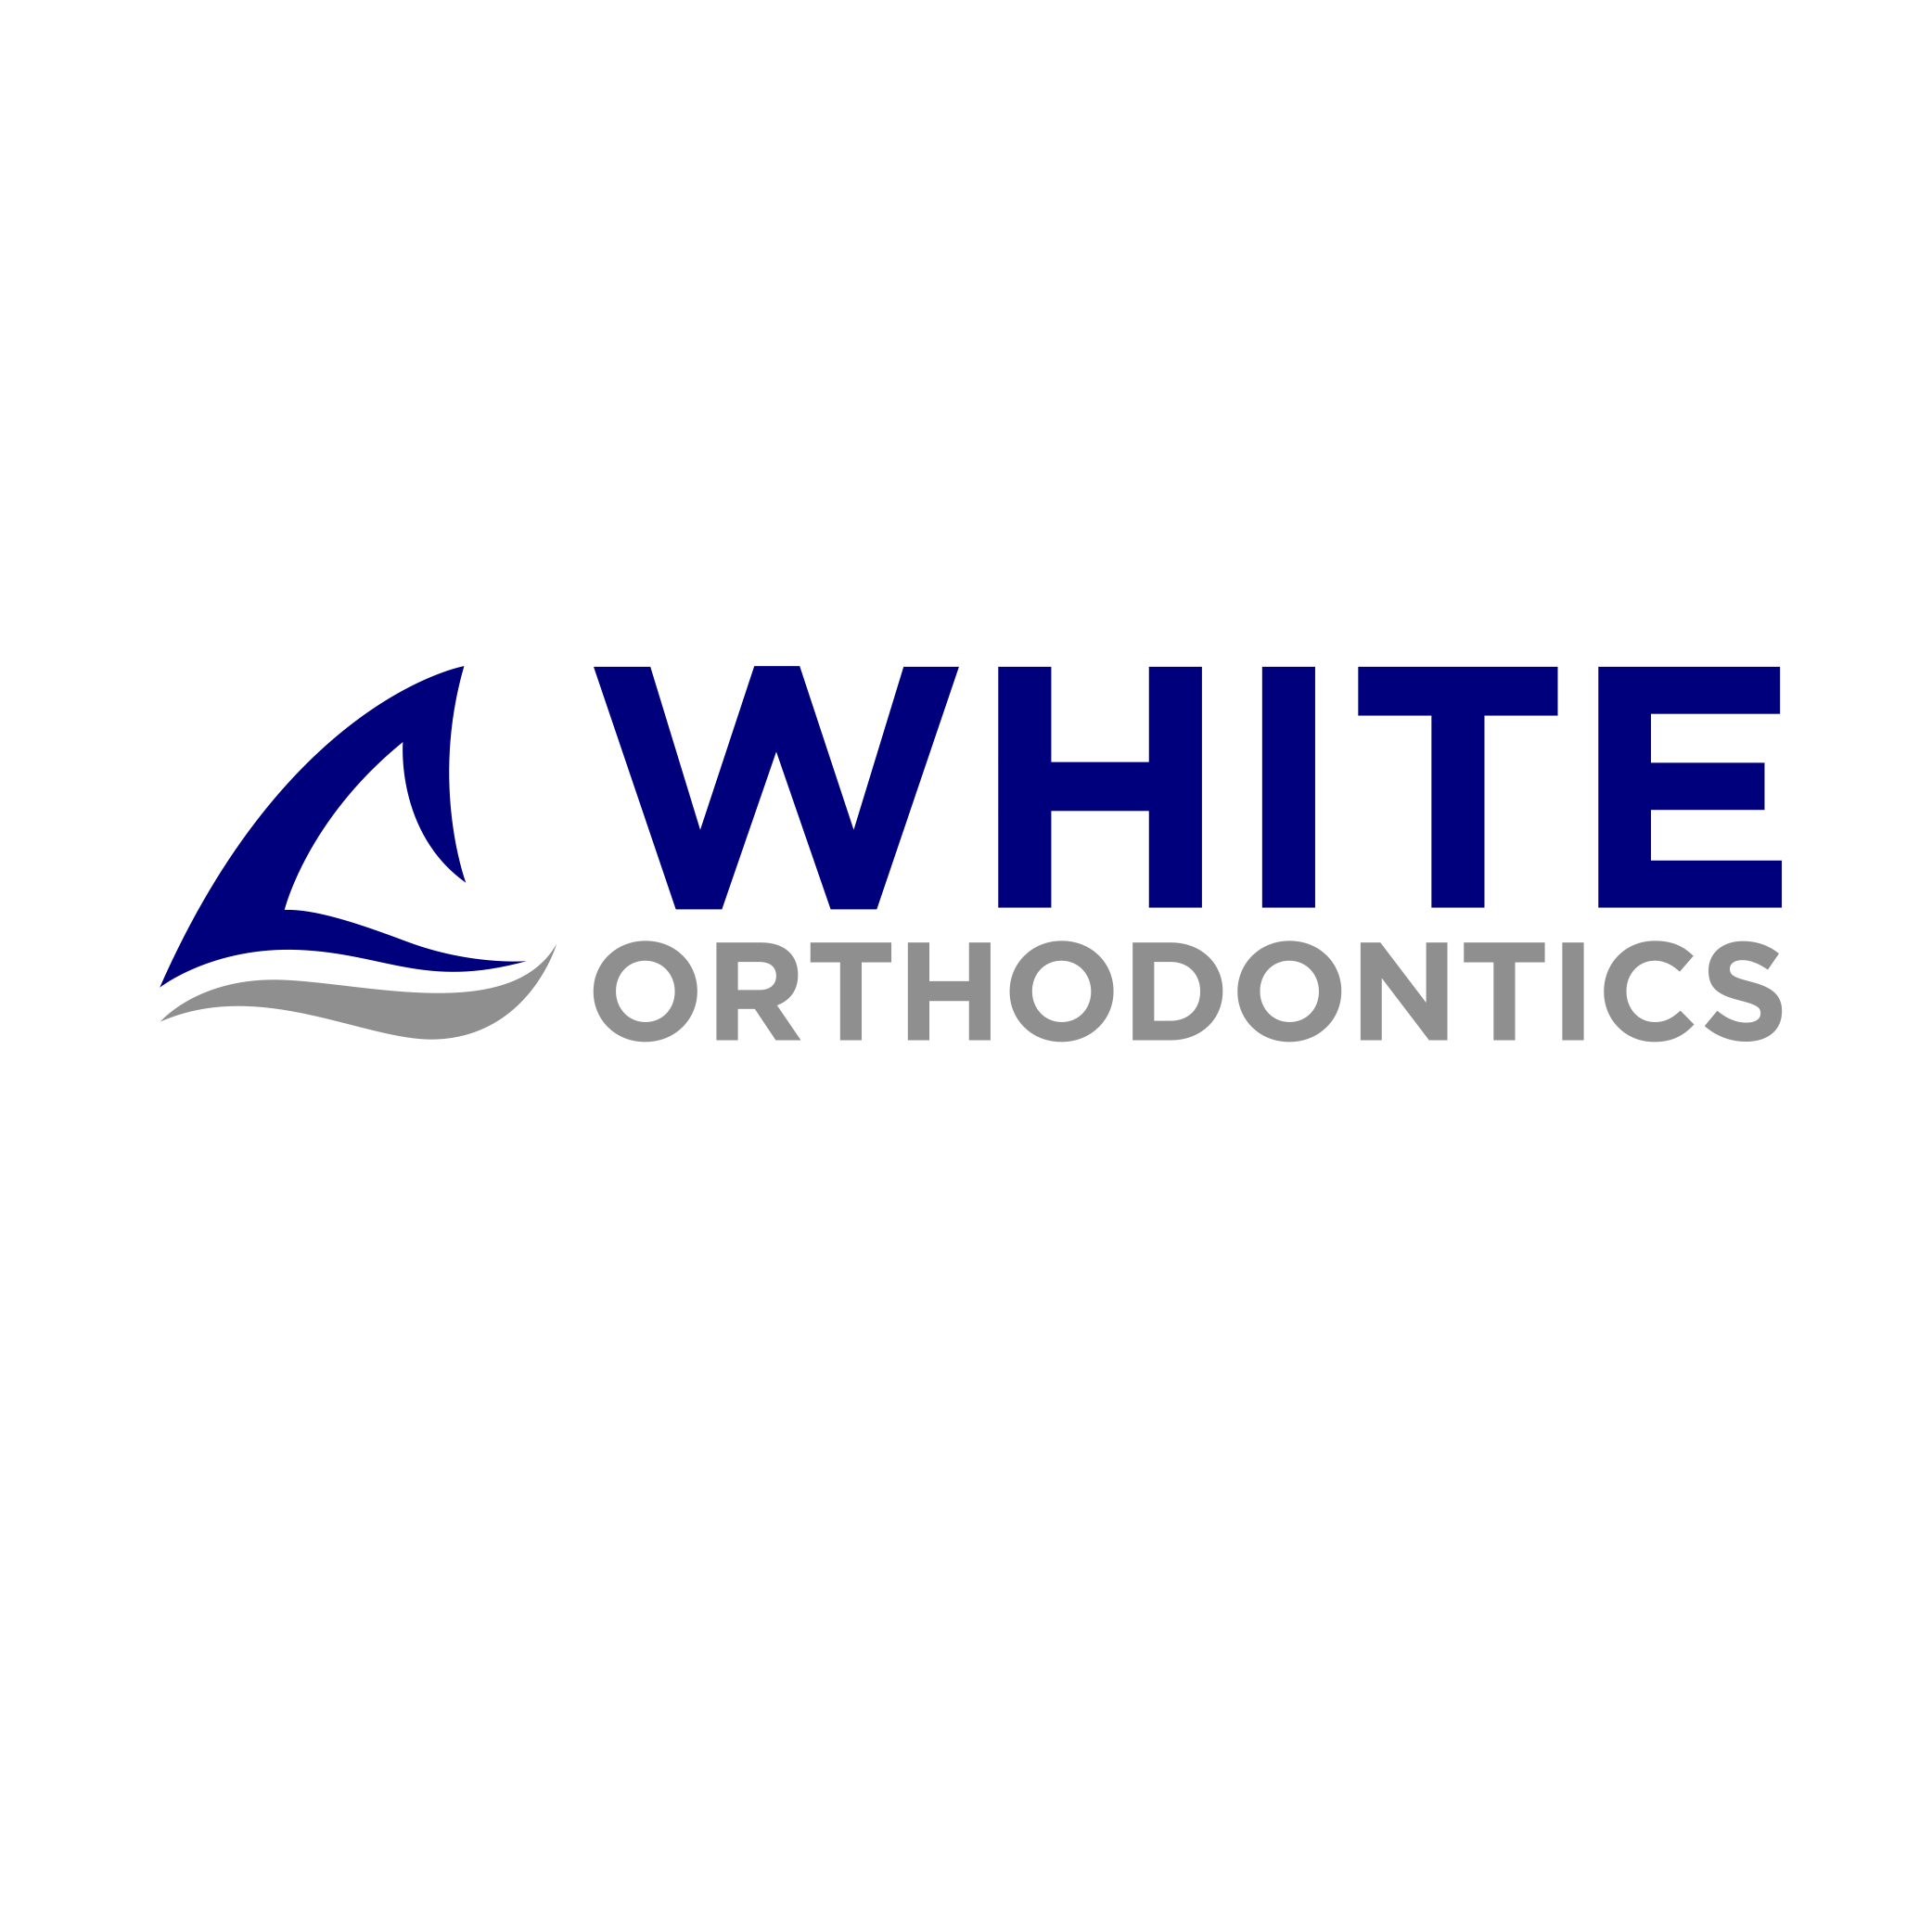 White Orthodontics - O'Fallon, MO - Dentists & Dental Services